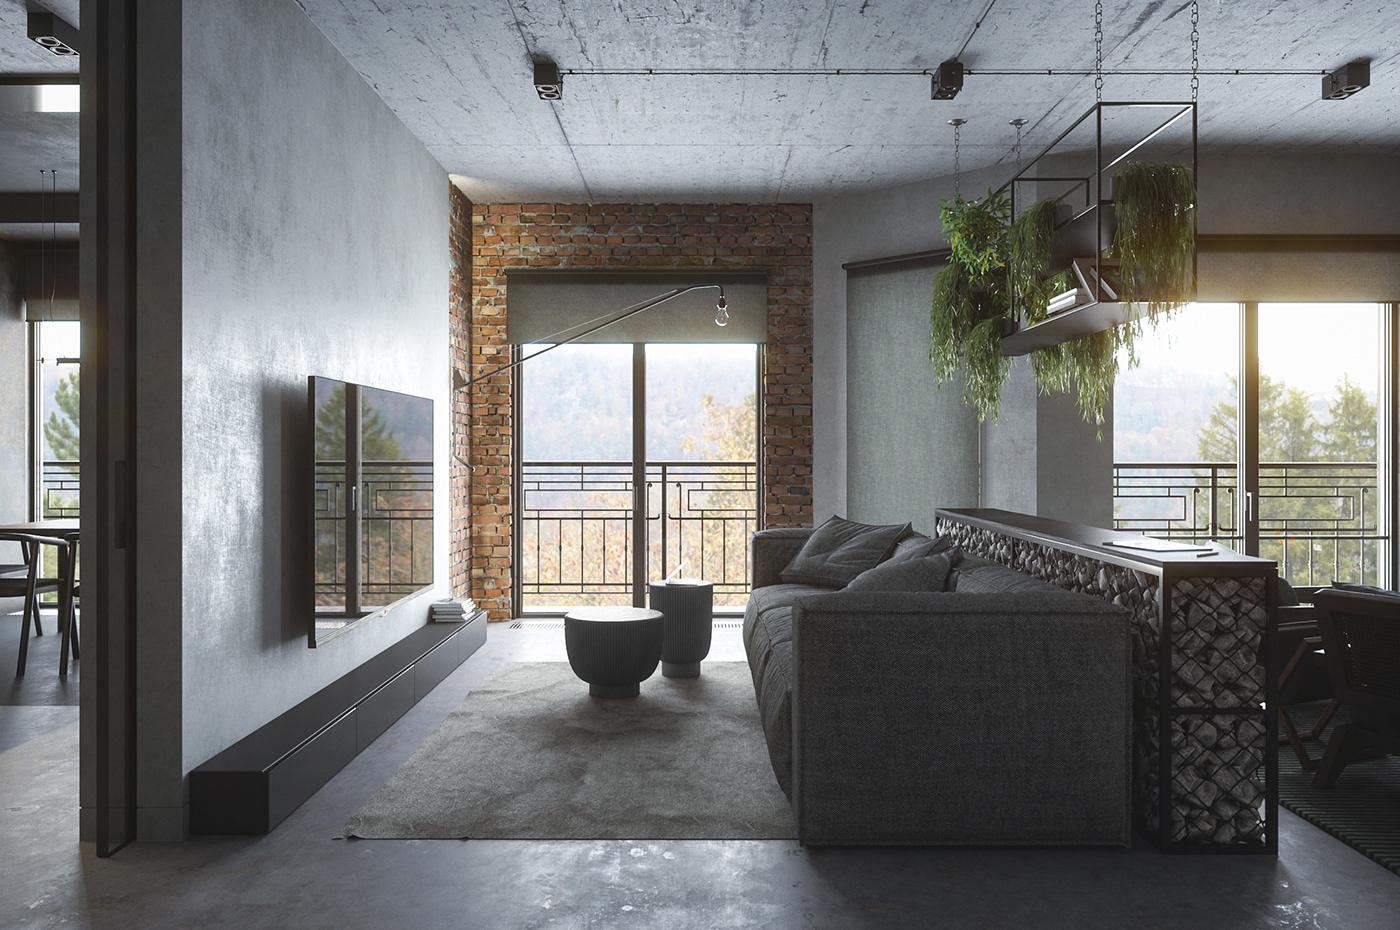 baxter black brick concrete fieldlight FStorm gabion grey rimadesio